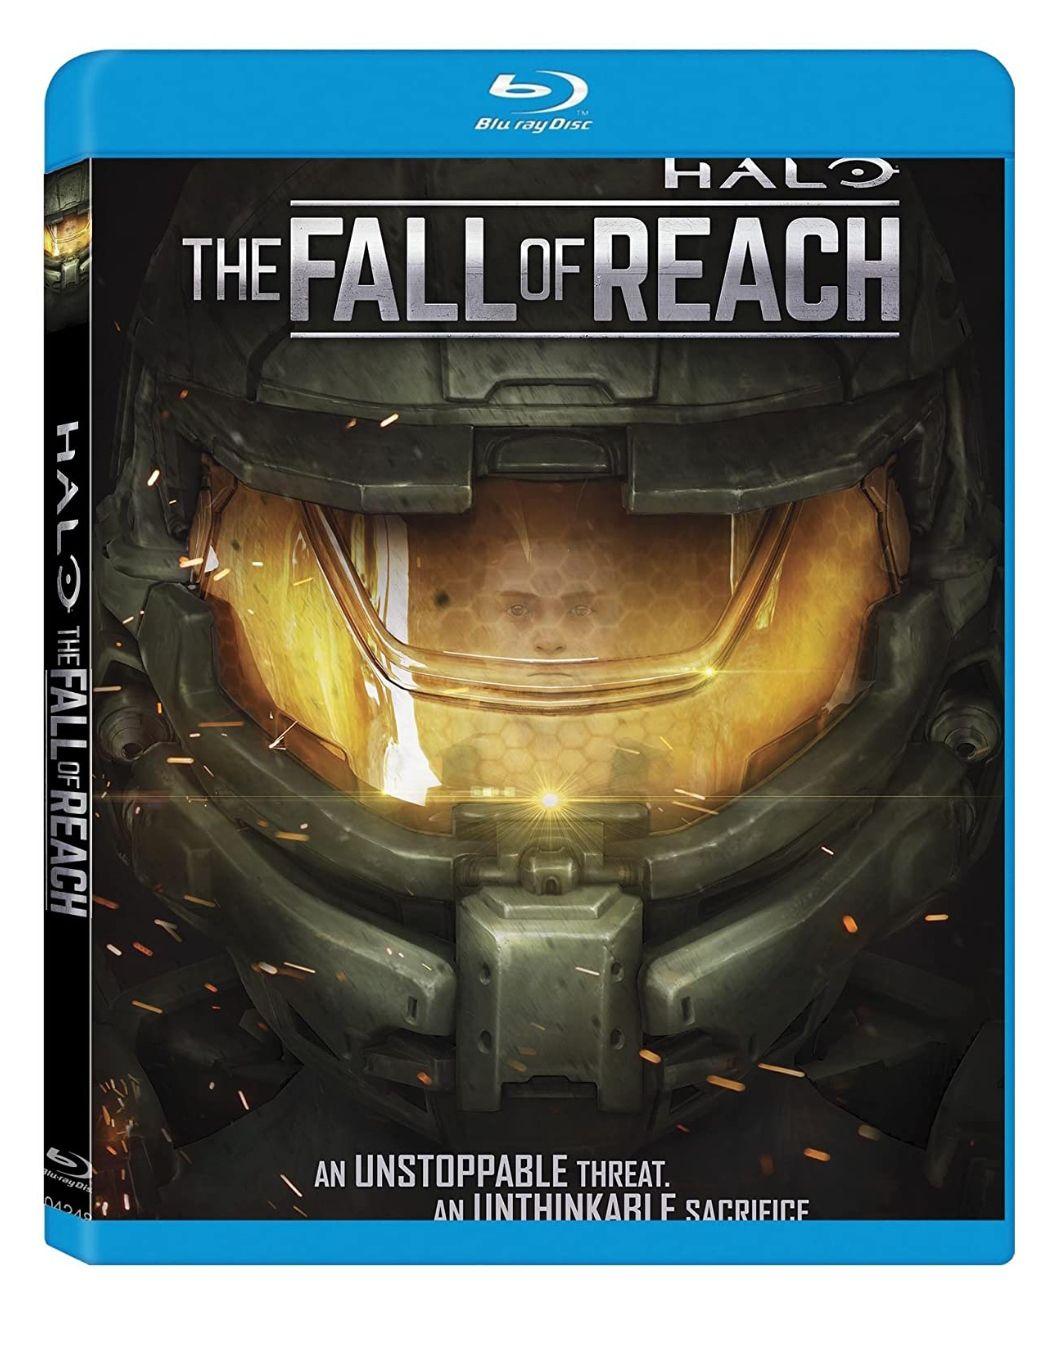 Amazon: Halo - The Fall of Reach (Blu-Ray)